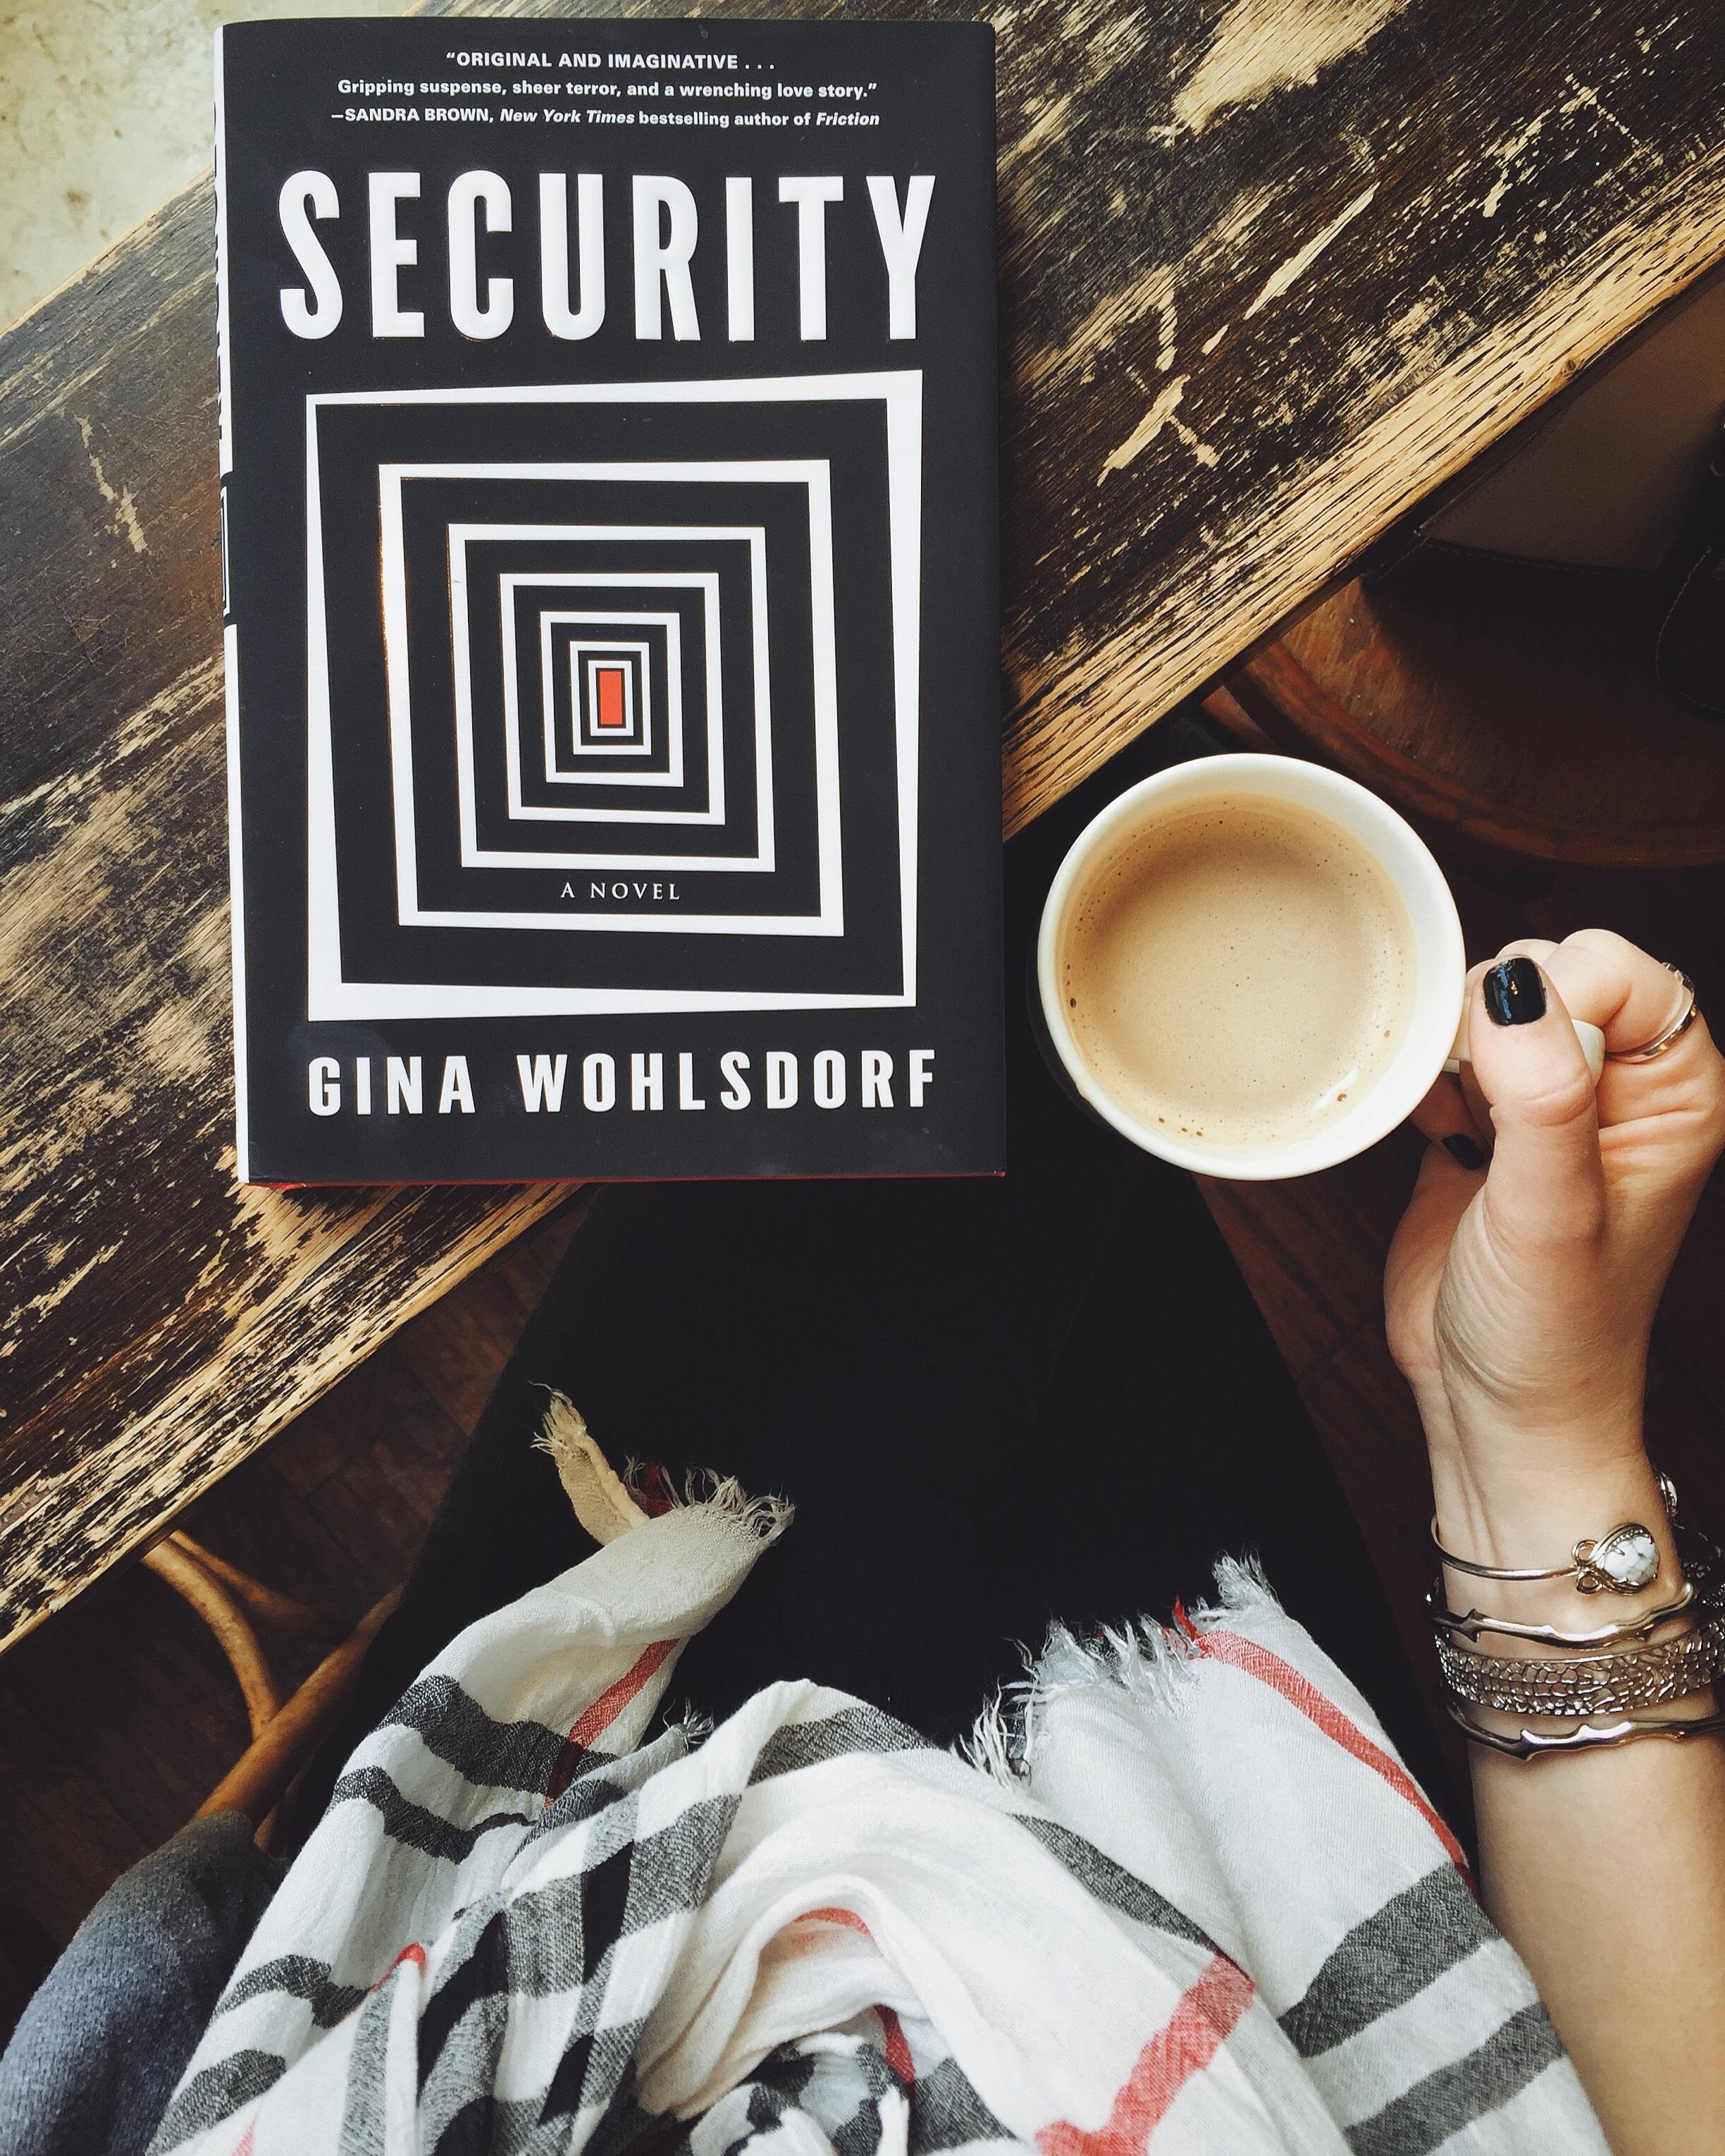 Security_Gina Wohlsdorf.jpg